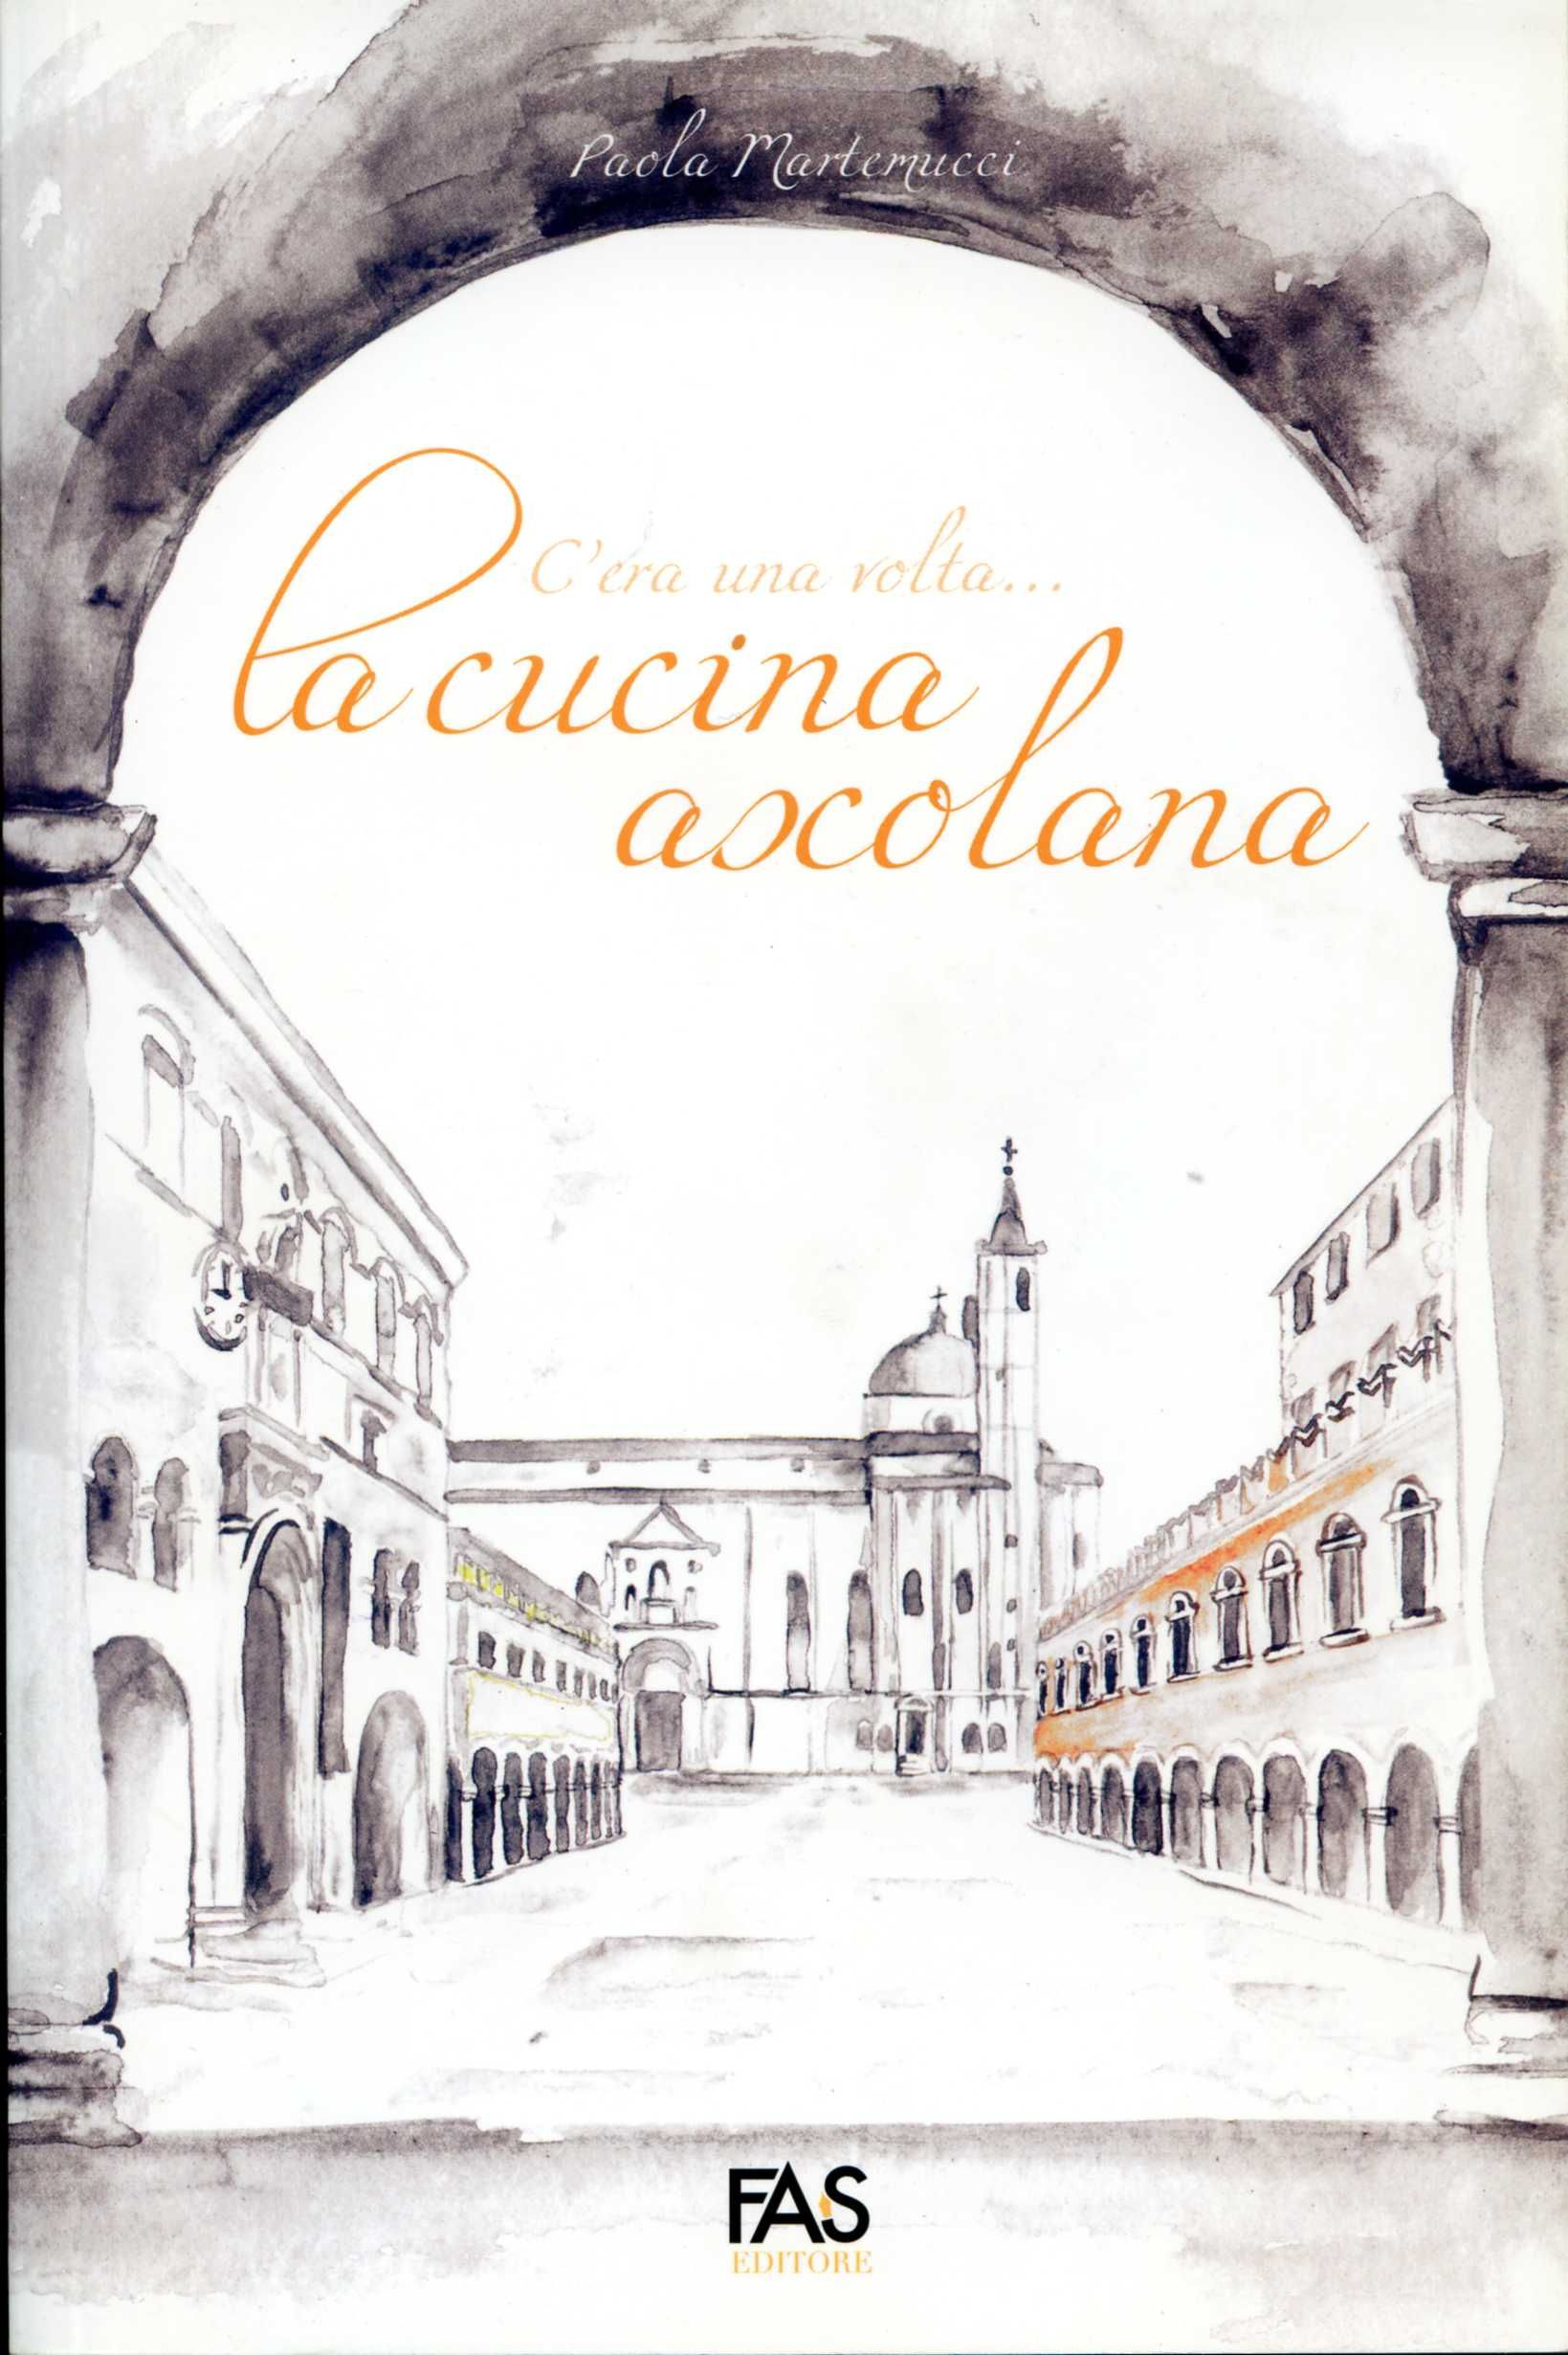 Martemucci-Cucina ascolana-Frontespizio